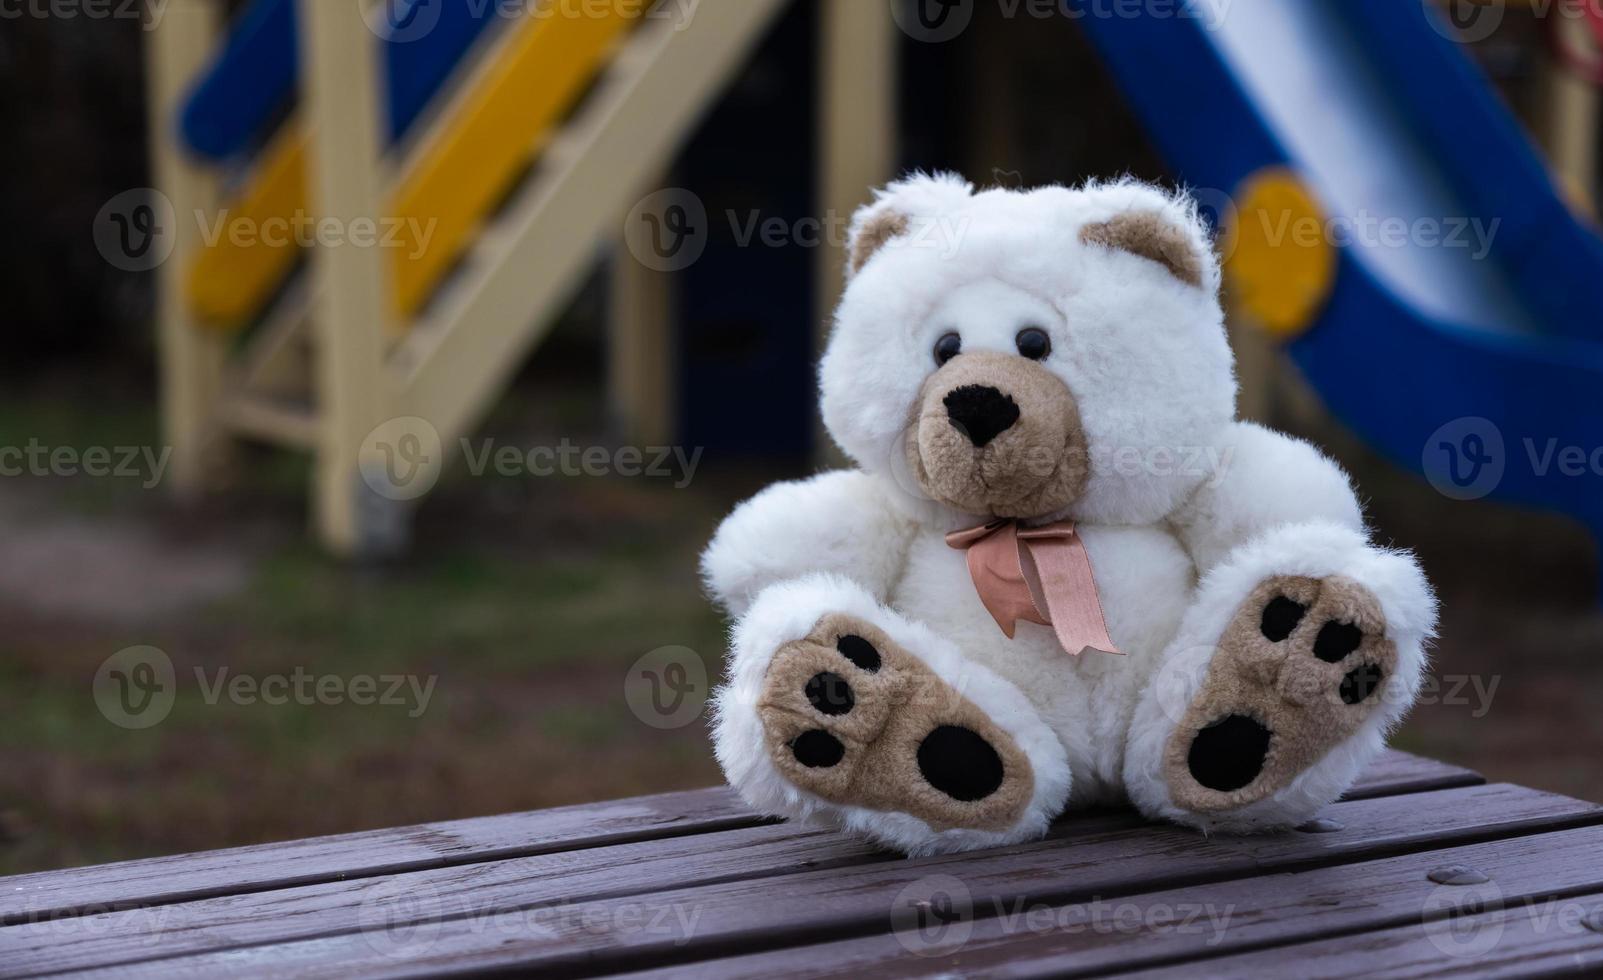 Sad lonely teddy bear photo